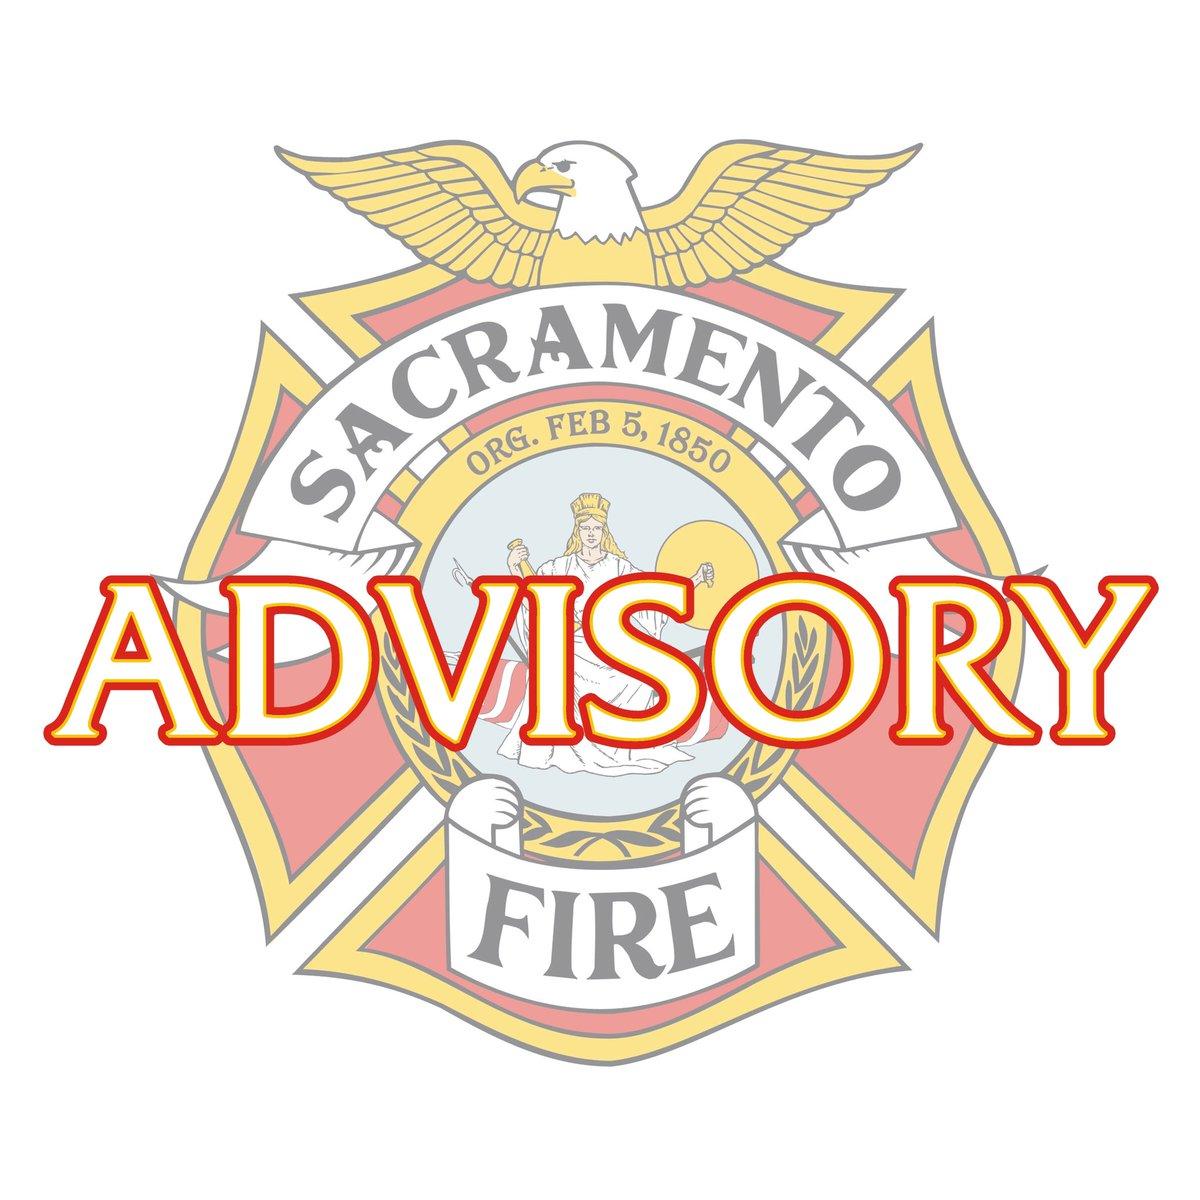 More Than 2 Dozen Injured In Sacramento Train Collision